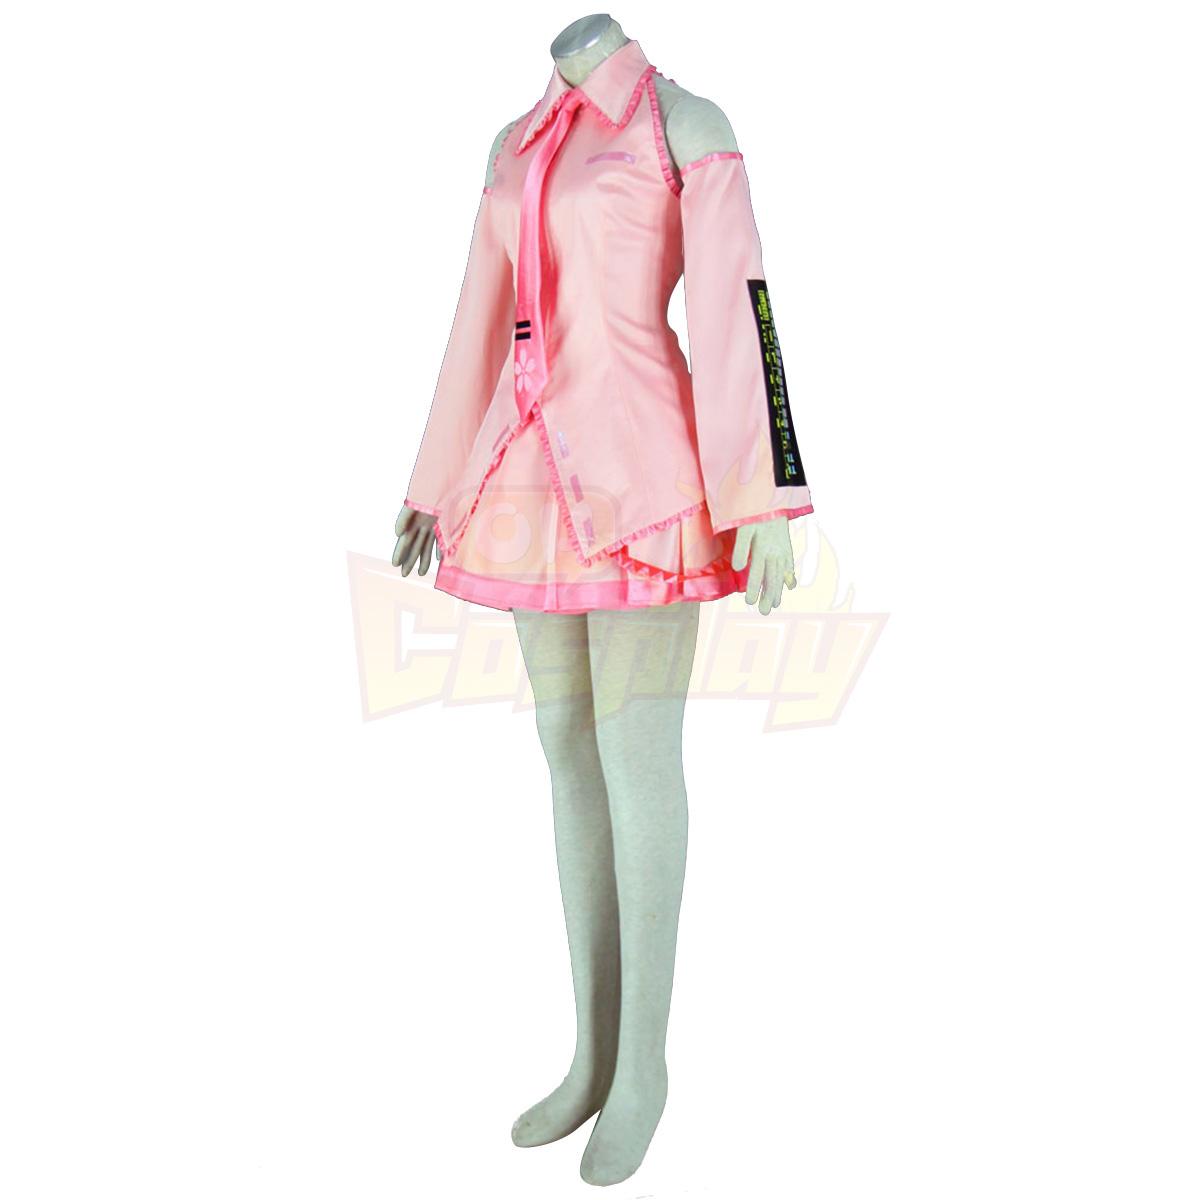 Fantasias Vocaloid Sakura Hatsune Miku 1 Trajes Cosplay